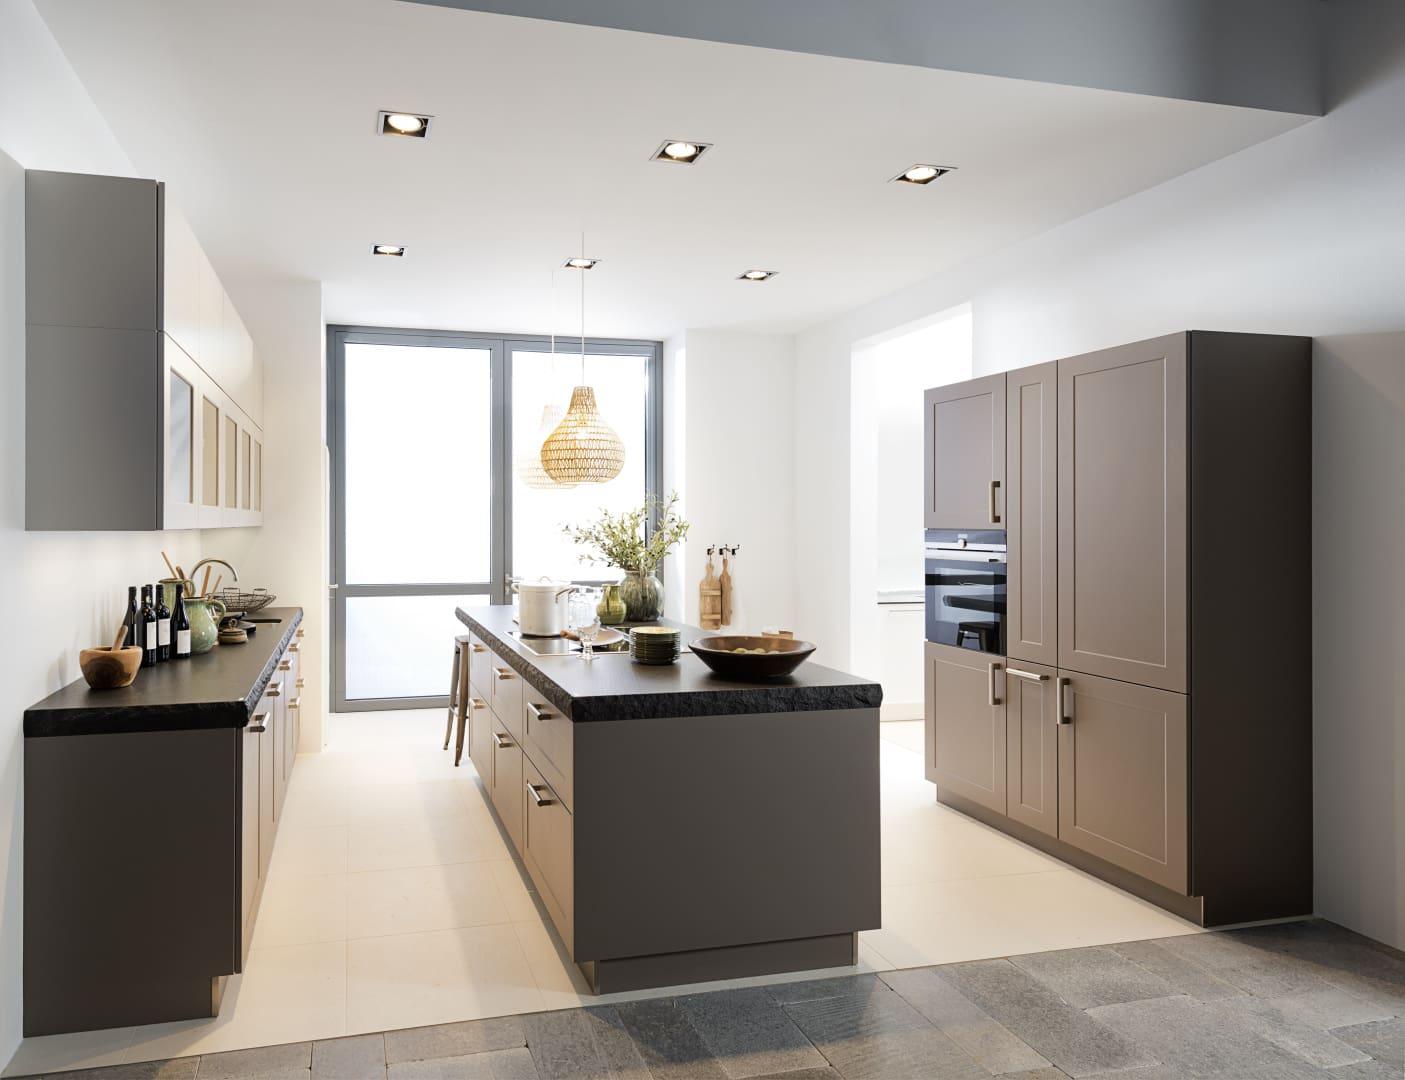 ciemno-beżowa kuchnia z ramką nolte kuchen model frame lack